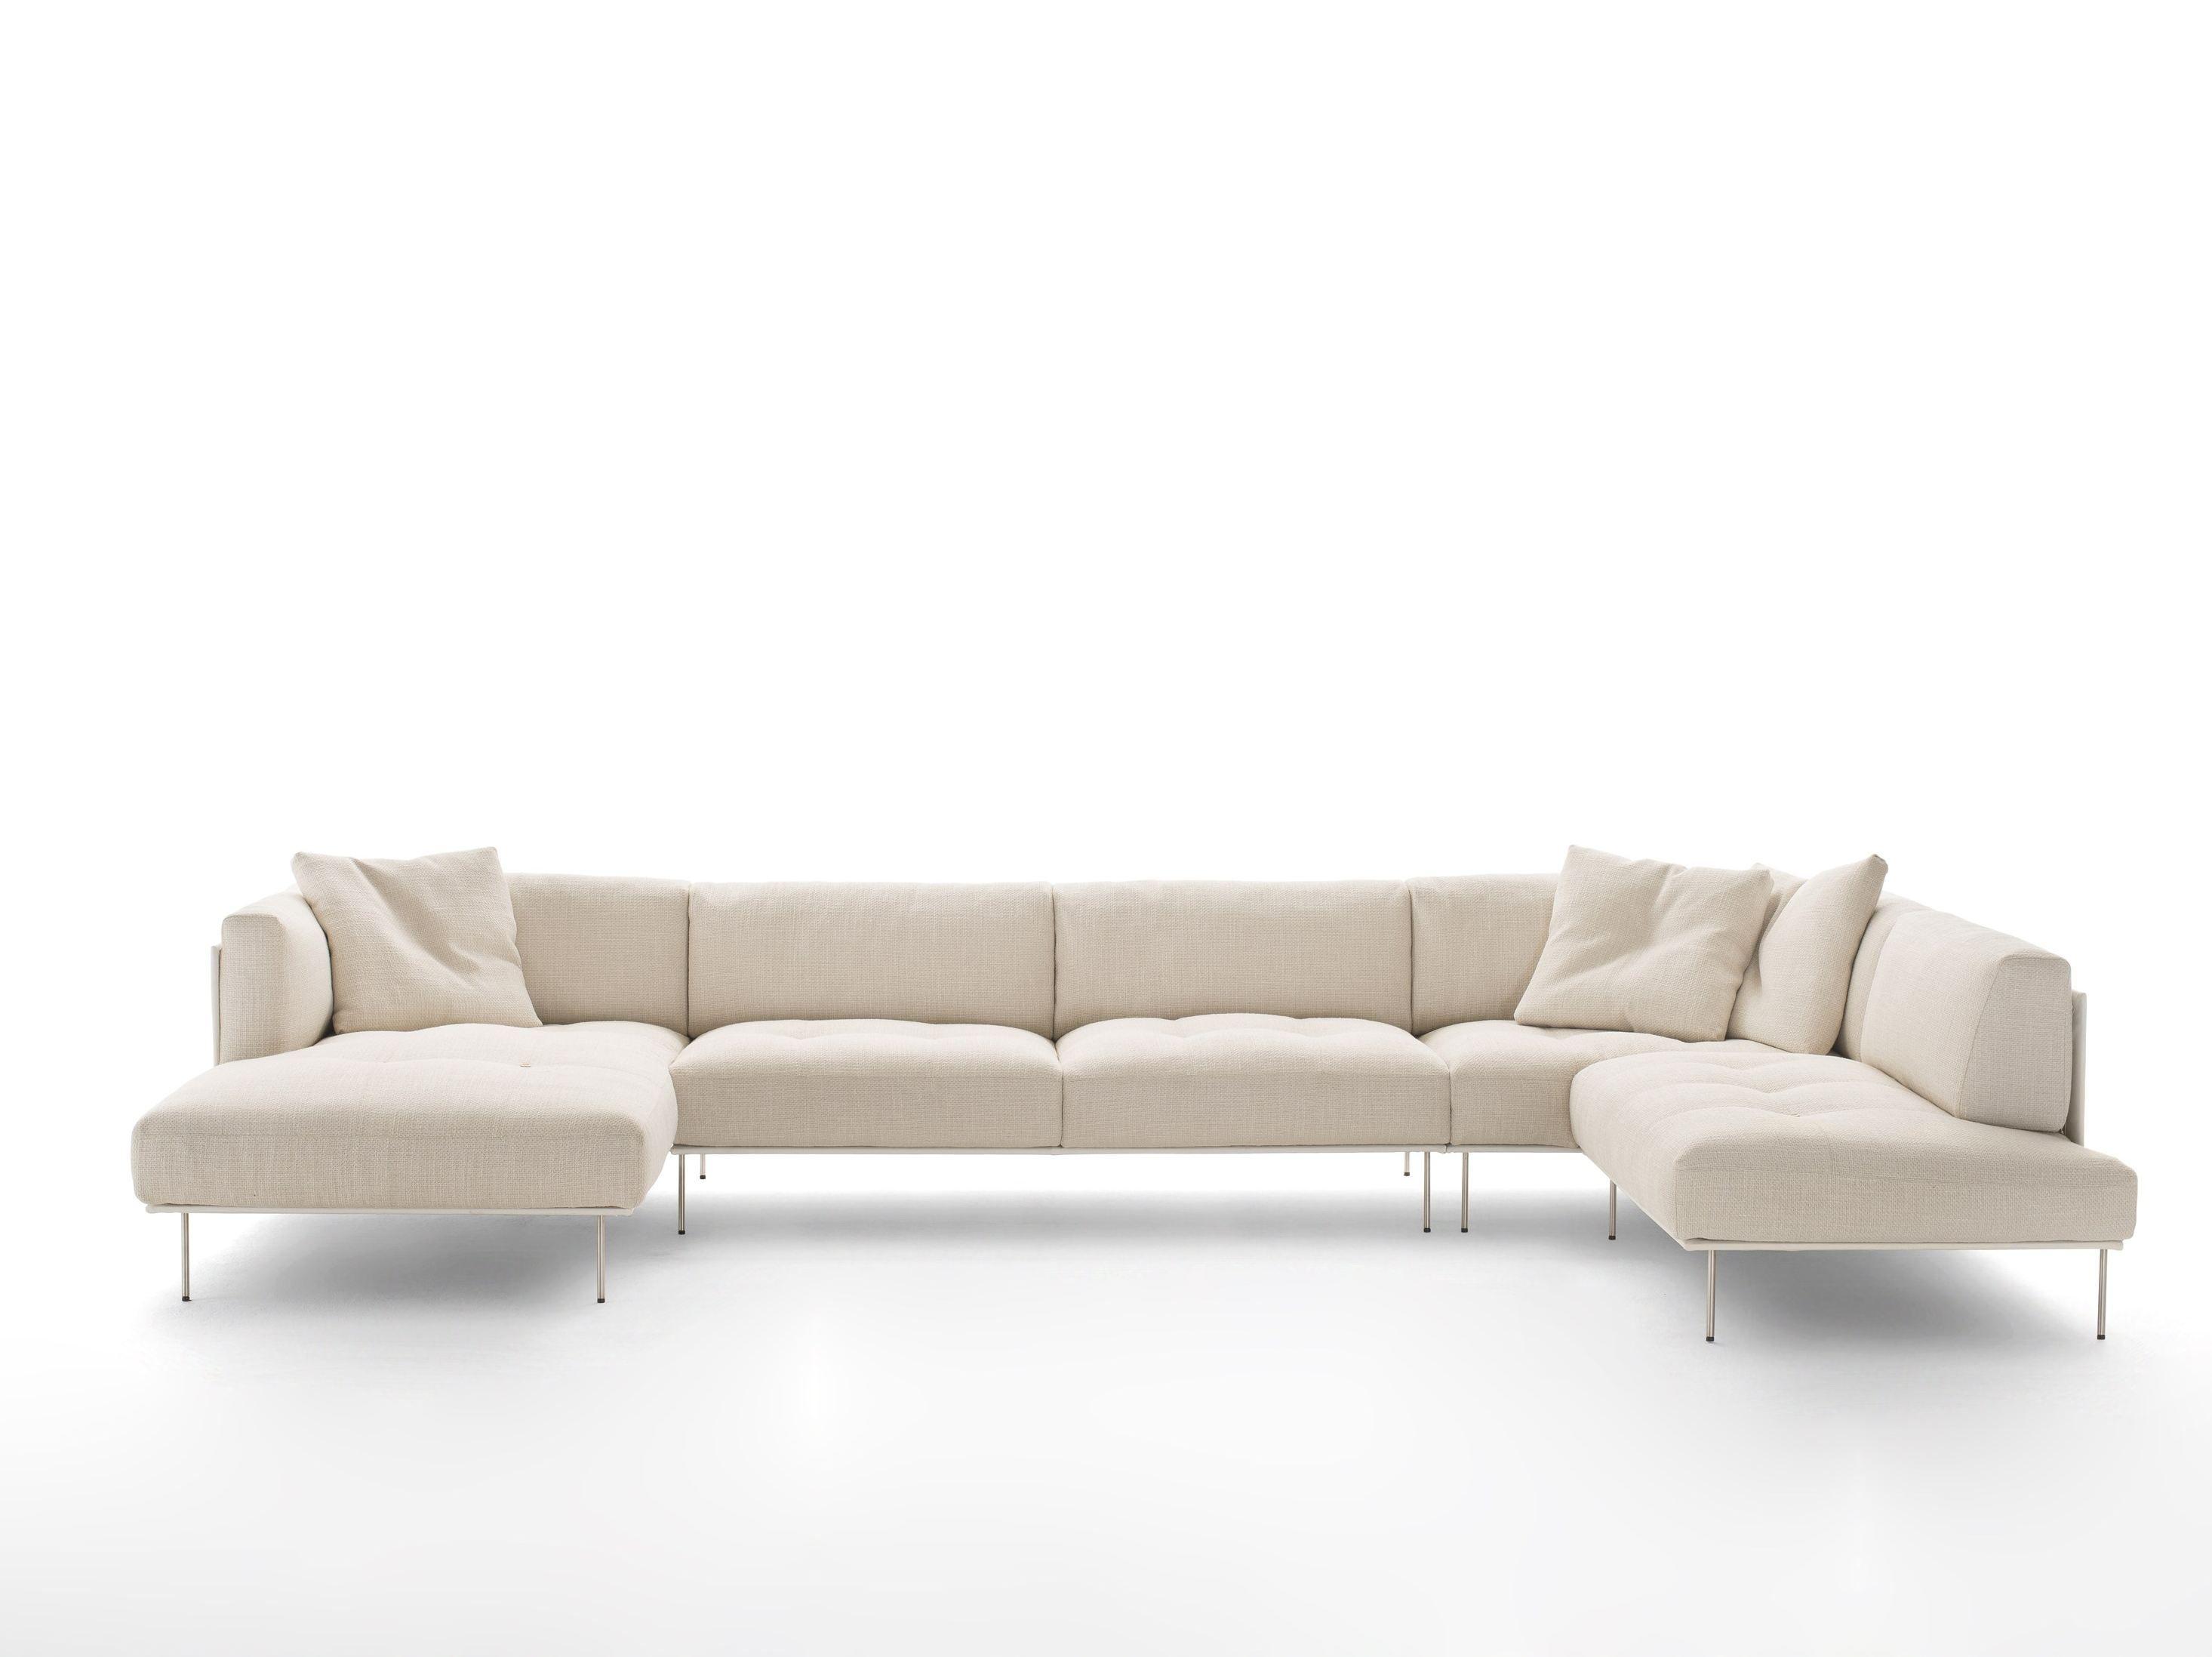 Living divani sofa softwall sofa by living divani design for Living divani softwall